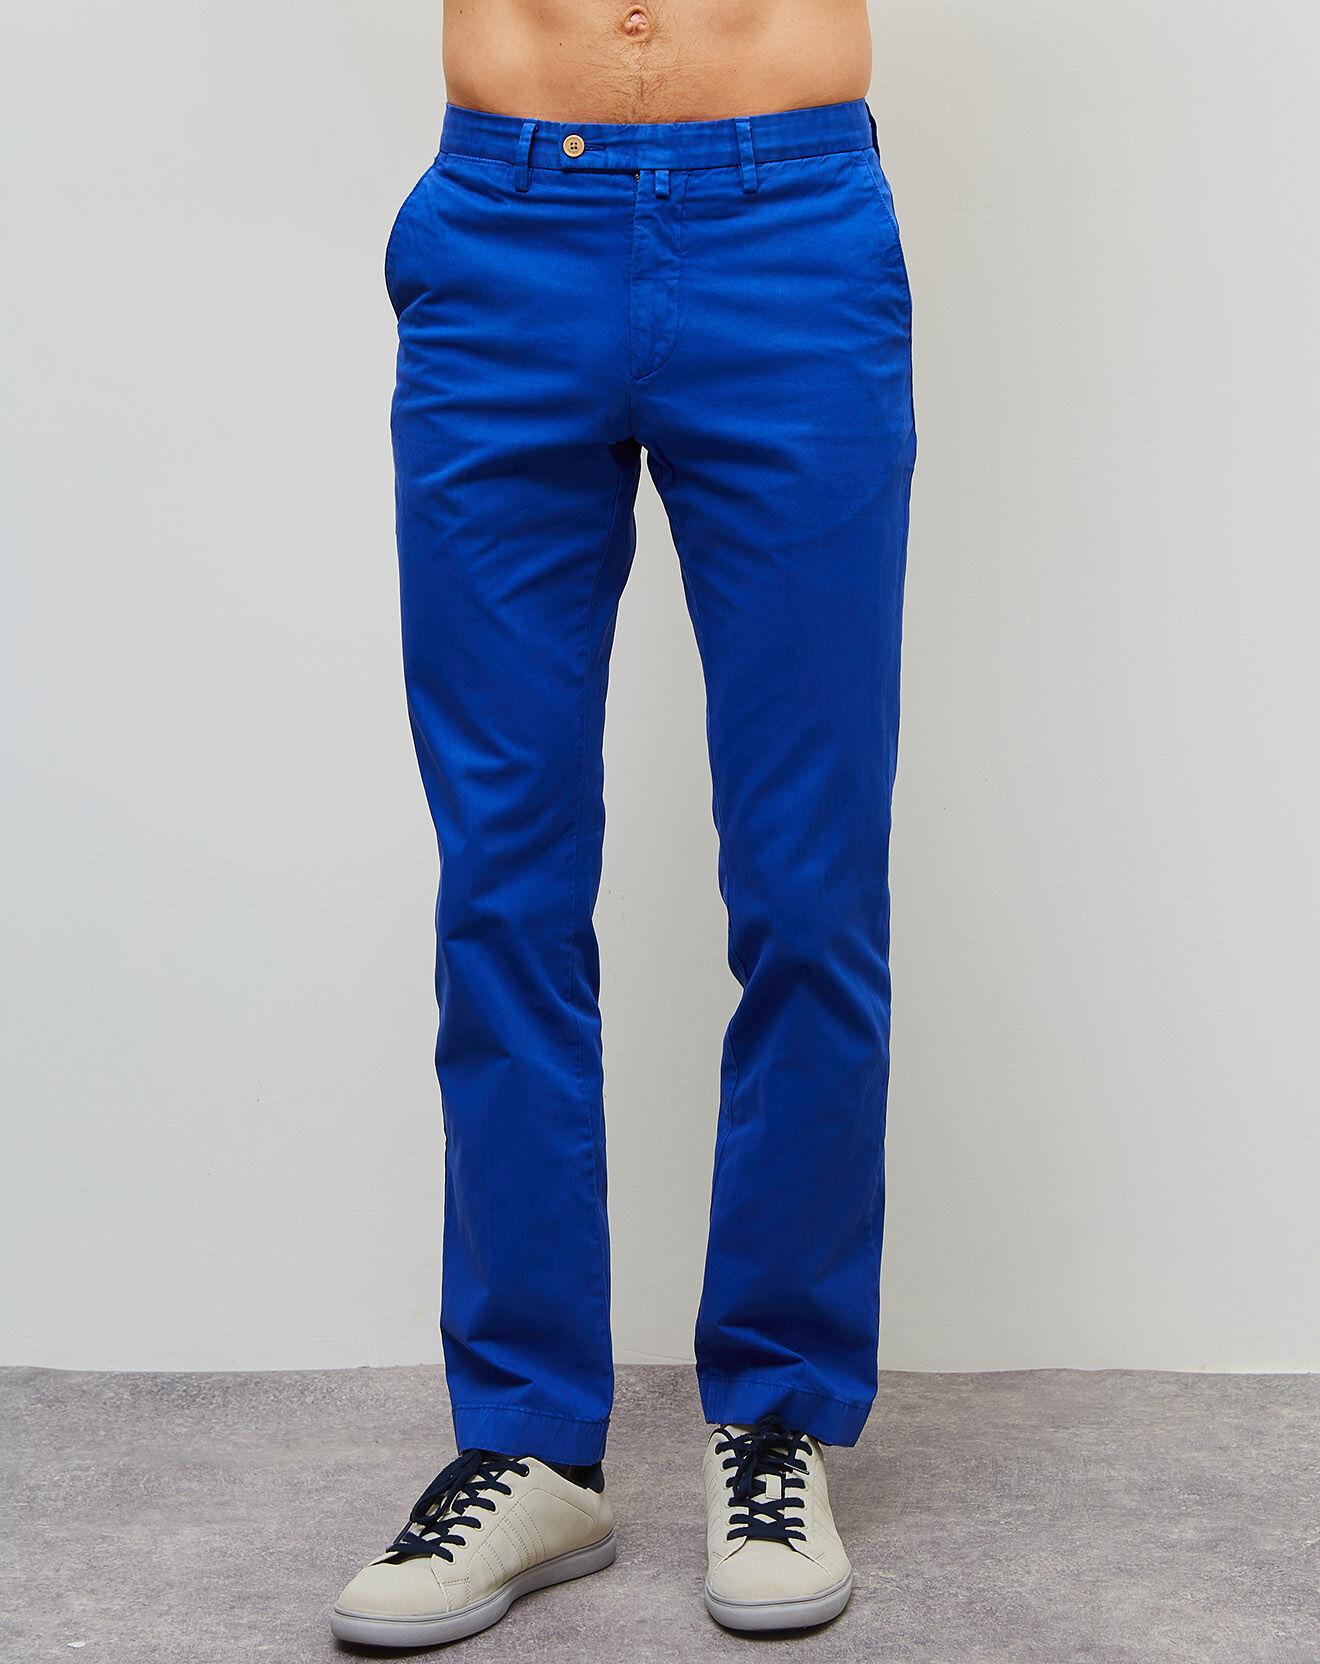 Pantalon chino Sanderson bleu klein - Hackett London - Modalova